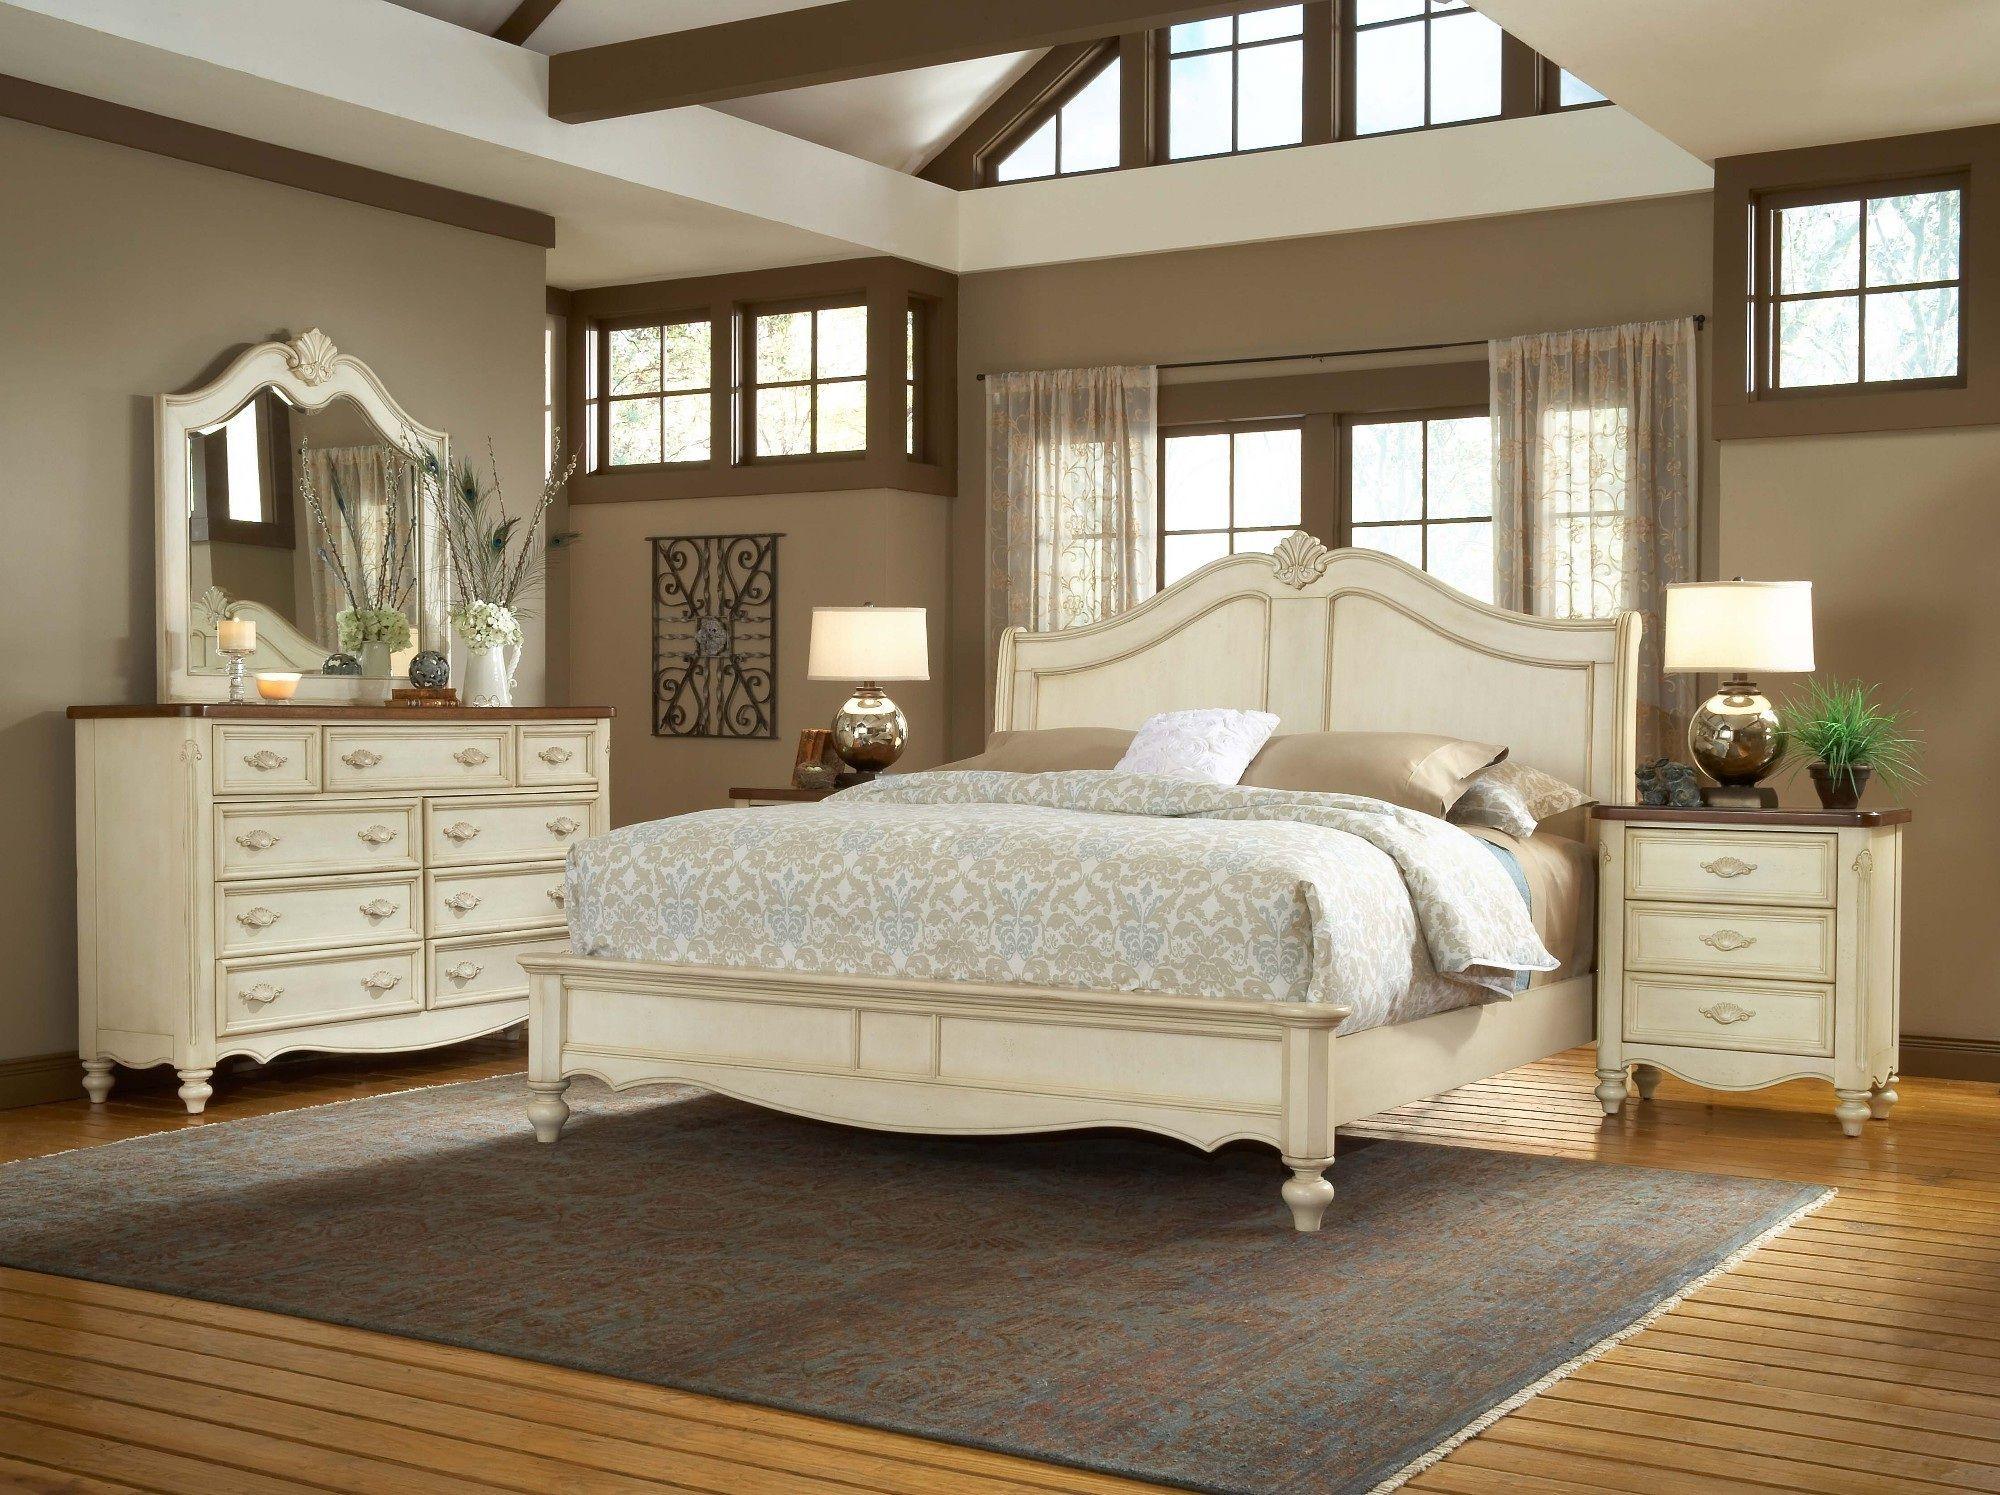 Enchanting Ikea Bedroom Sets Home Decor Pinterest Ikea bedroom